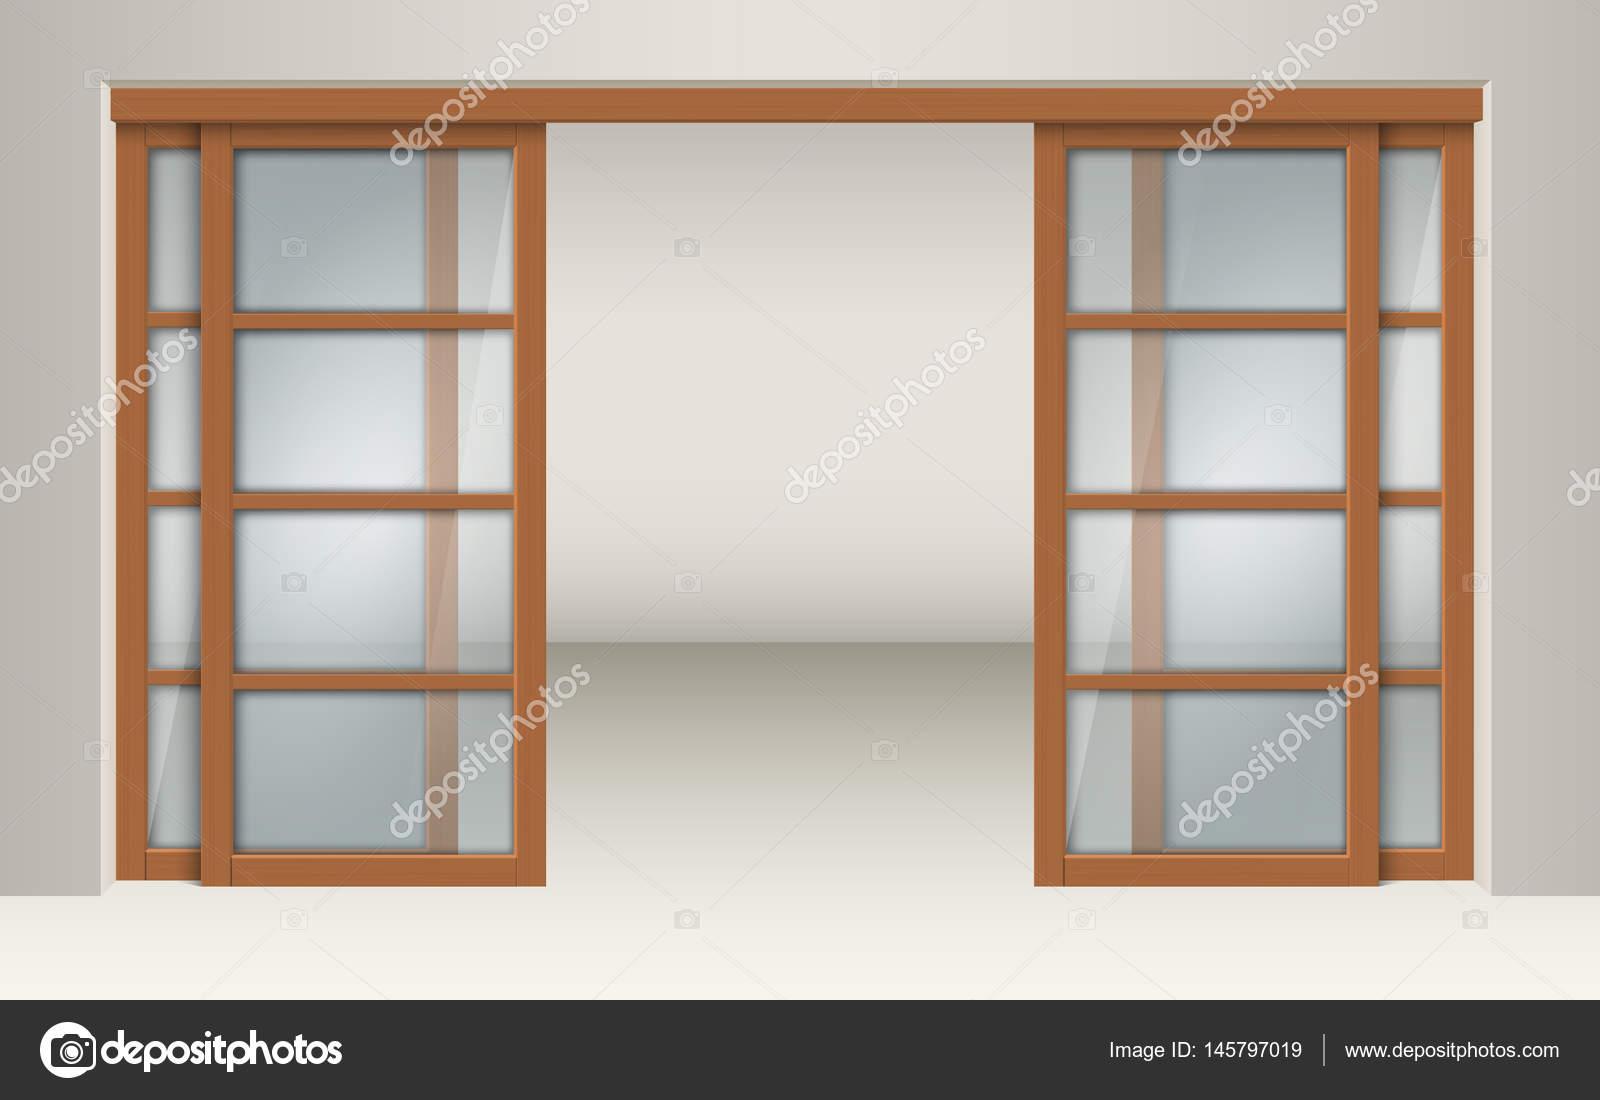 Puertas corredizas de vidrio con dinteles de madera for Puerta corrediza de madera